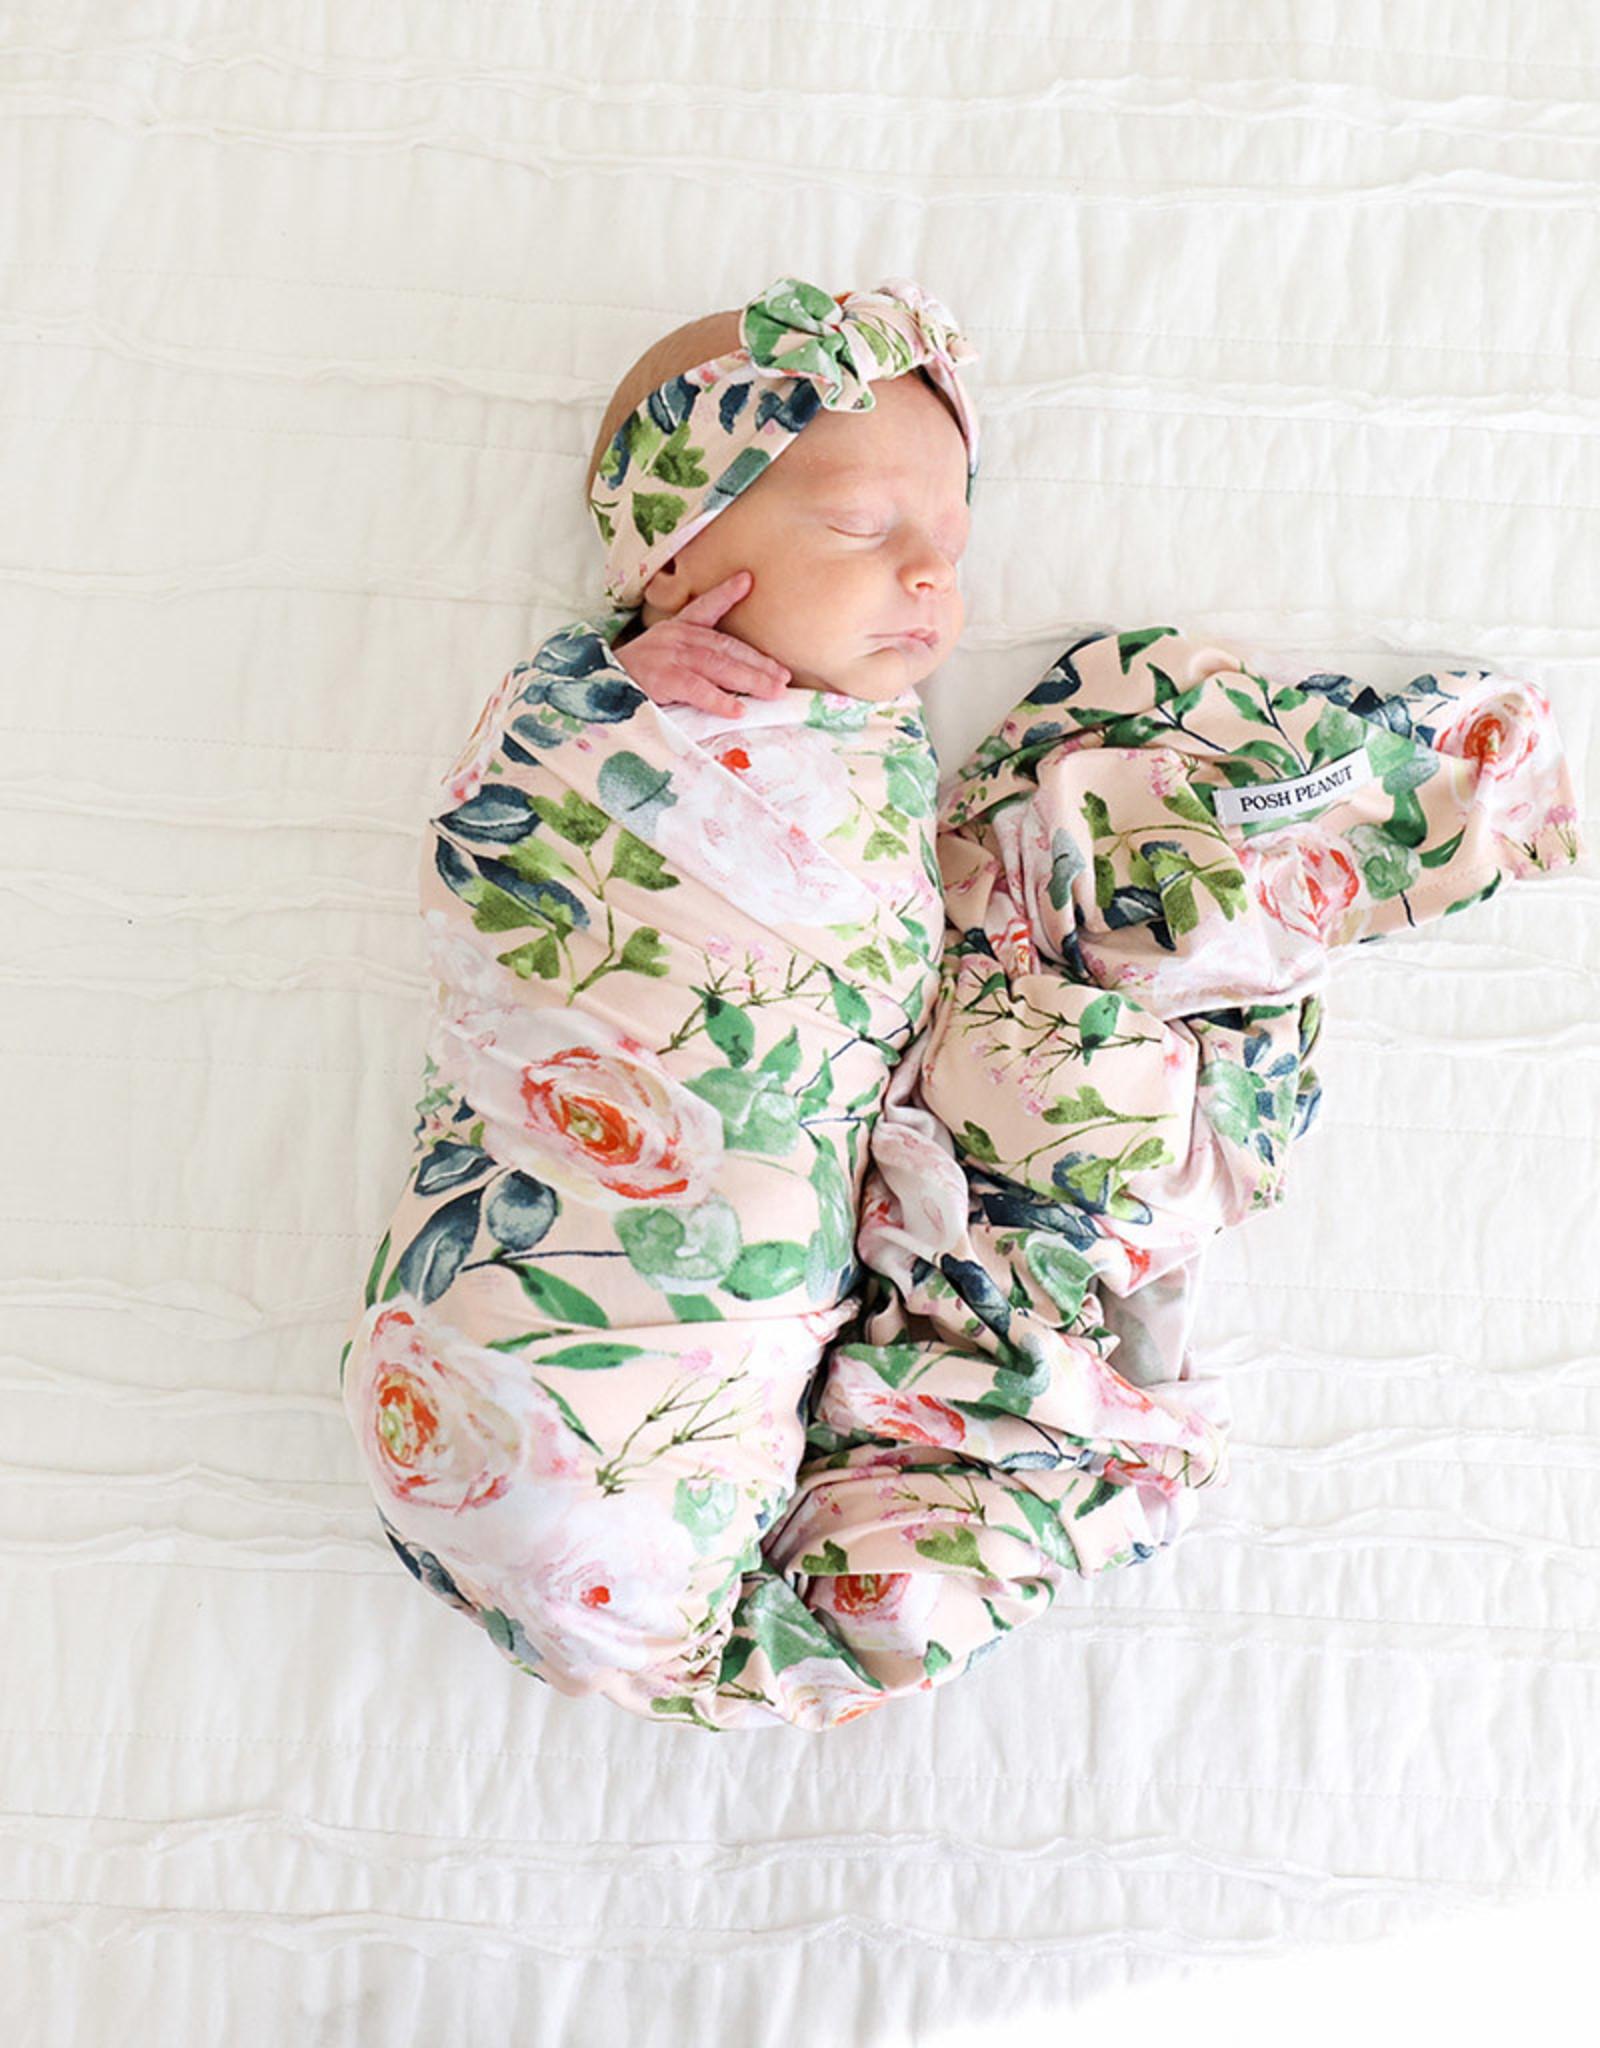 POSH PEANUT Harper - Infant Swaddle and Headwrap Set